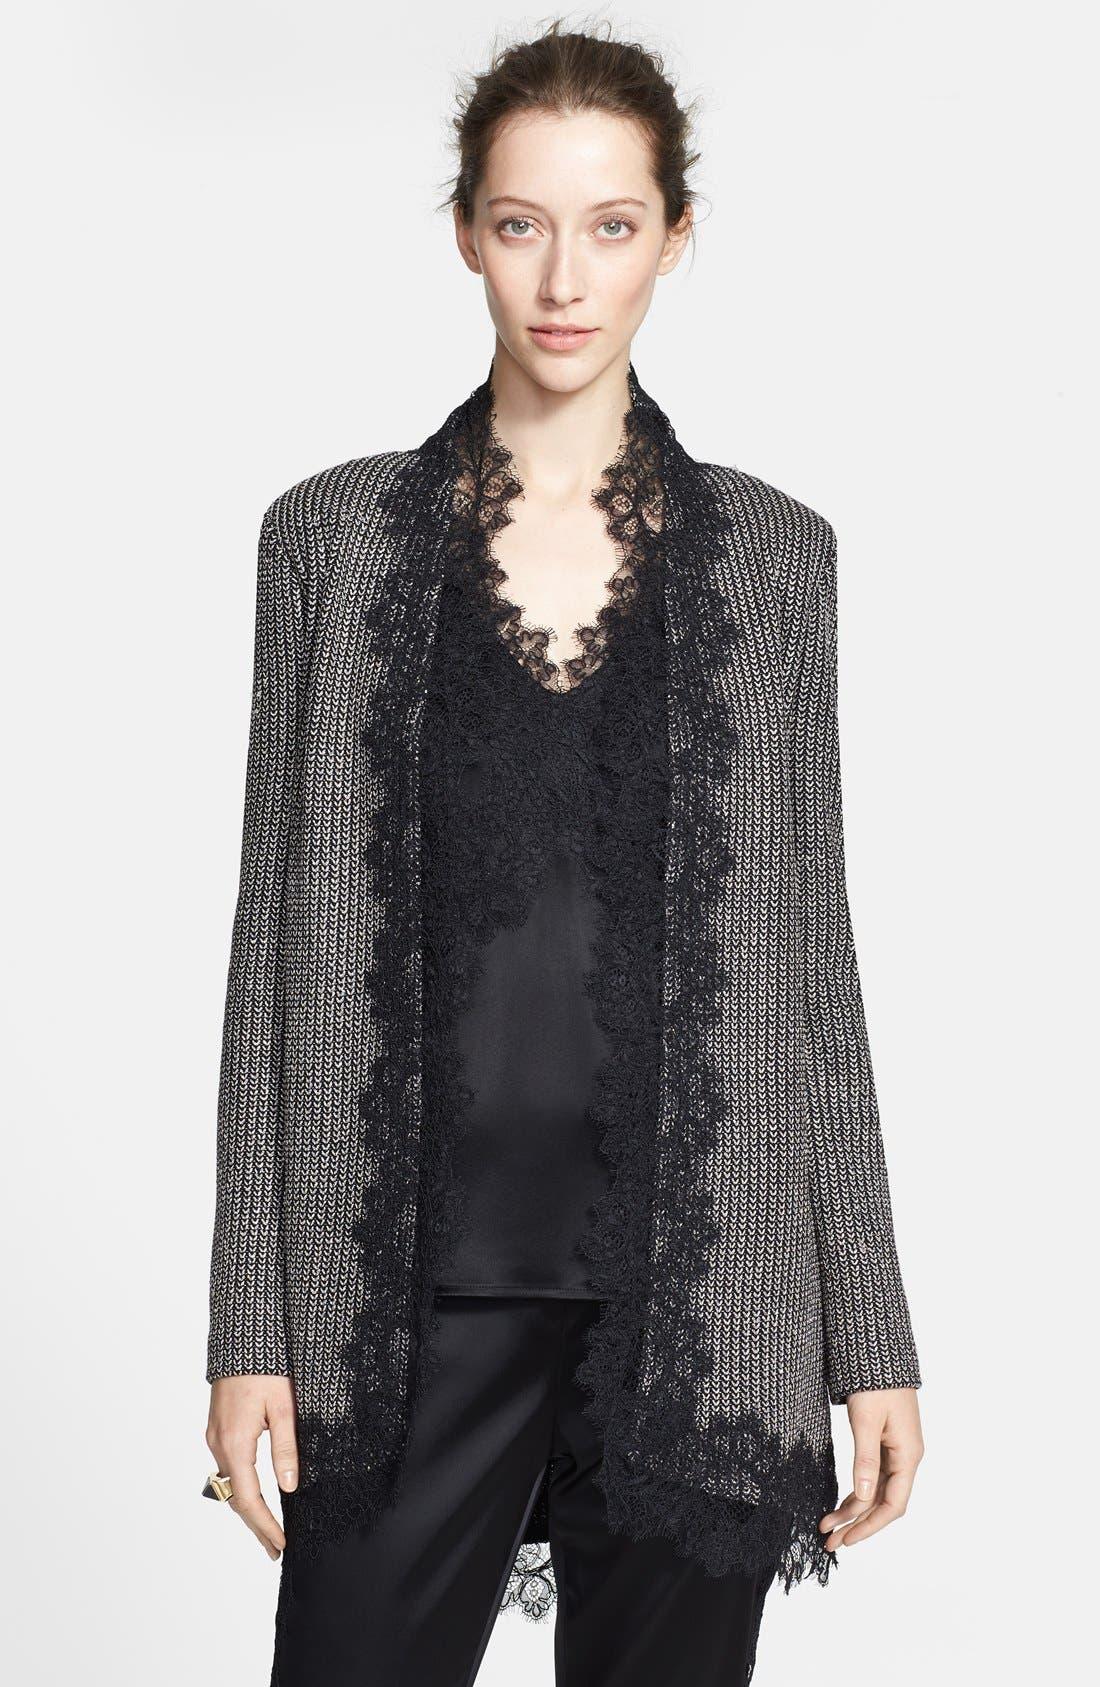 Main Image - St. John Collection Lace Trim Metallic Micro Knit Jacket